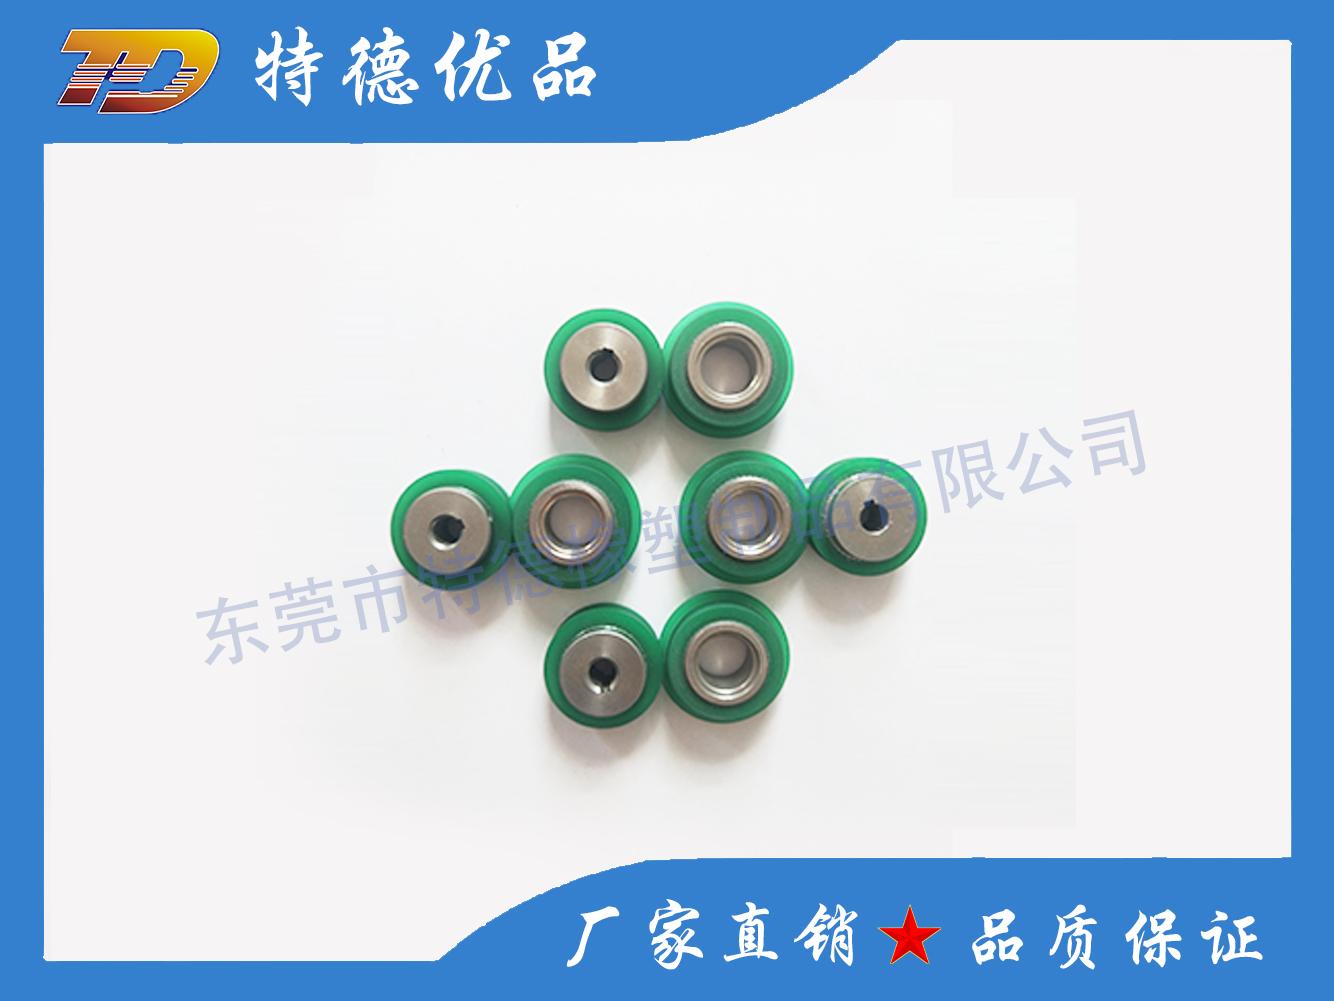 Folding trademark rubber roller